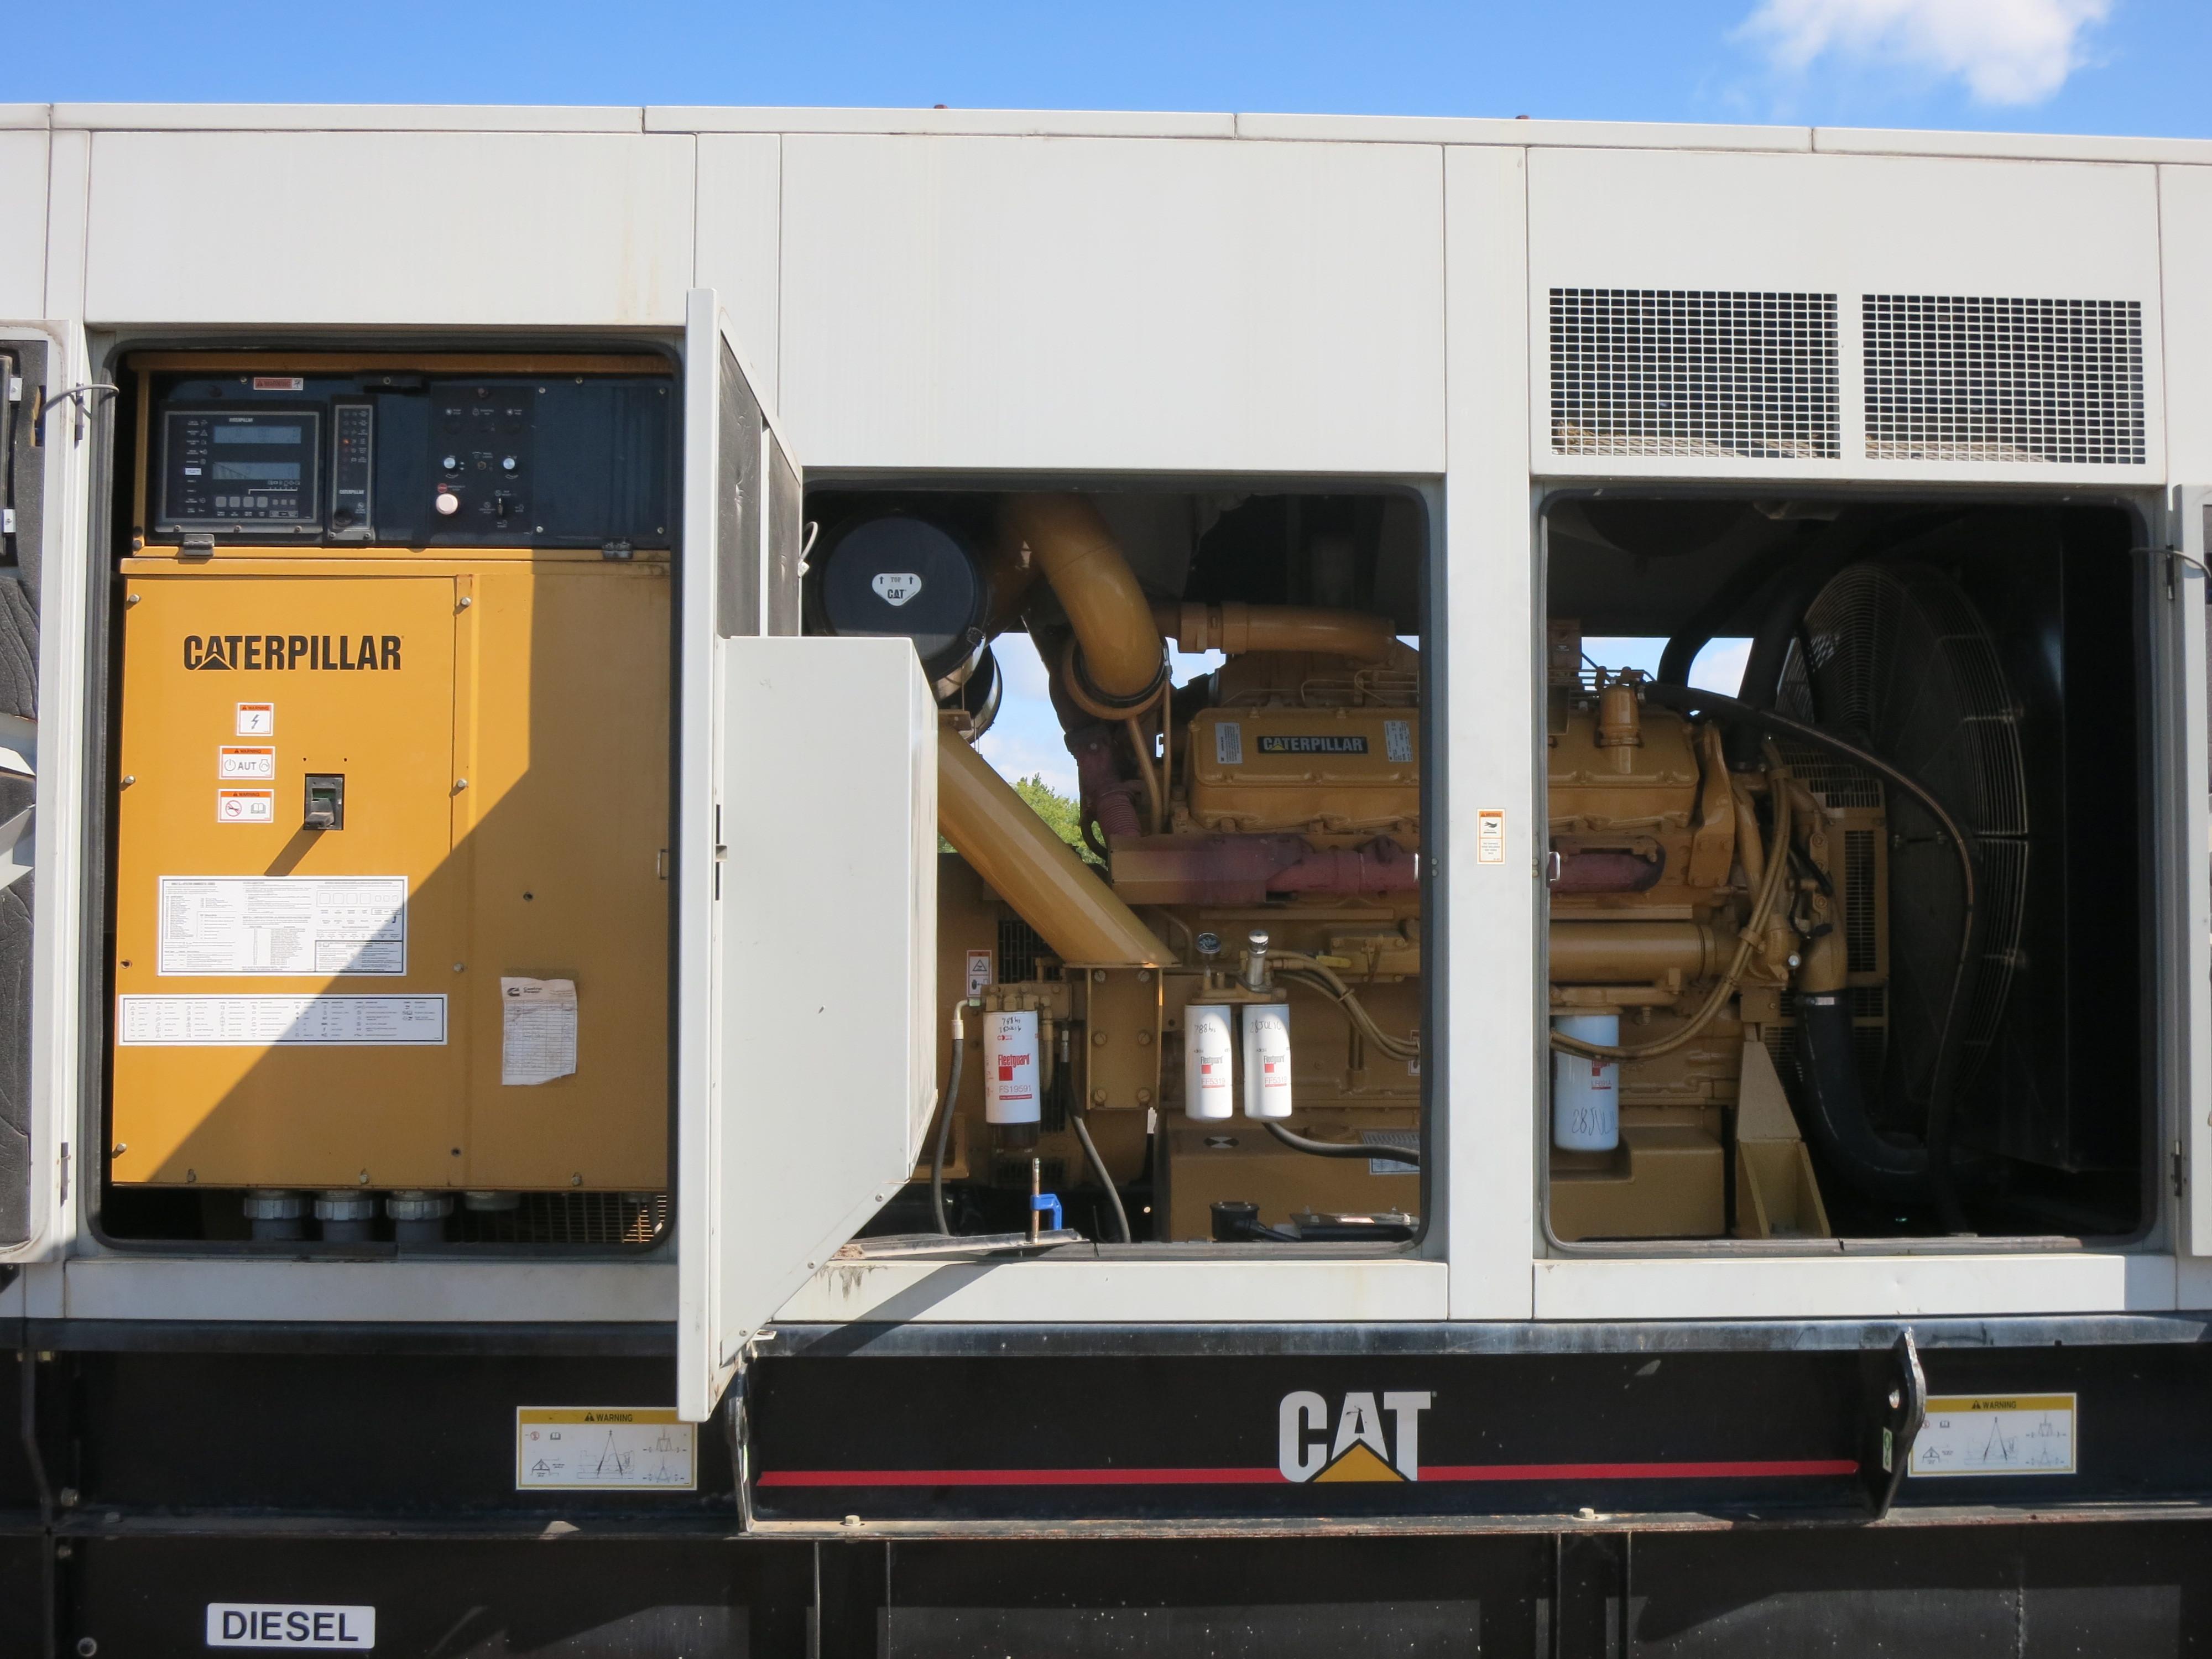 Used Caterpillar 3412 Diesel Generator 796 Hrs